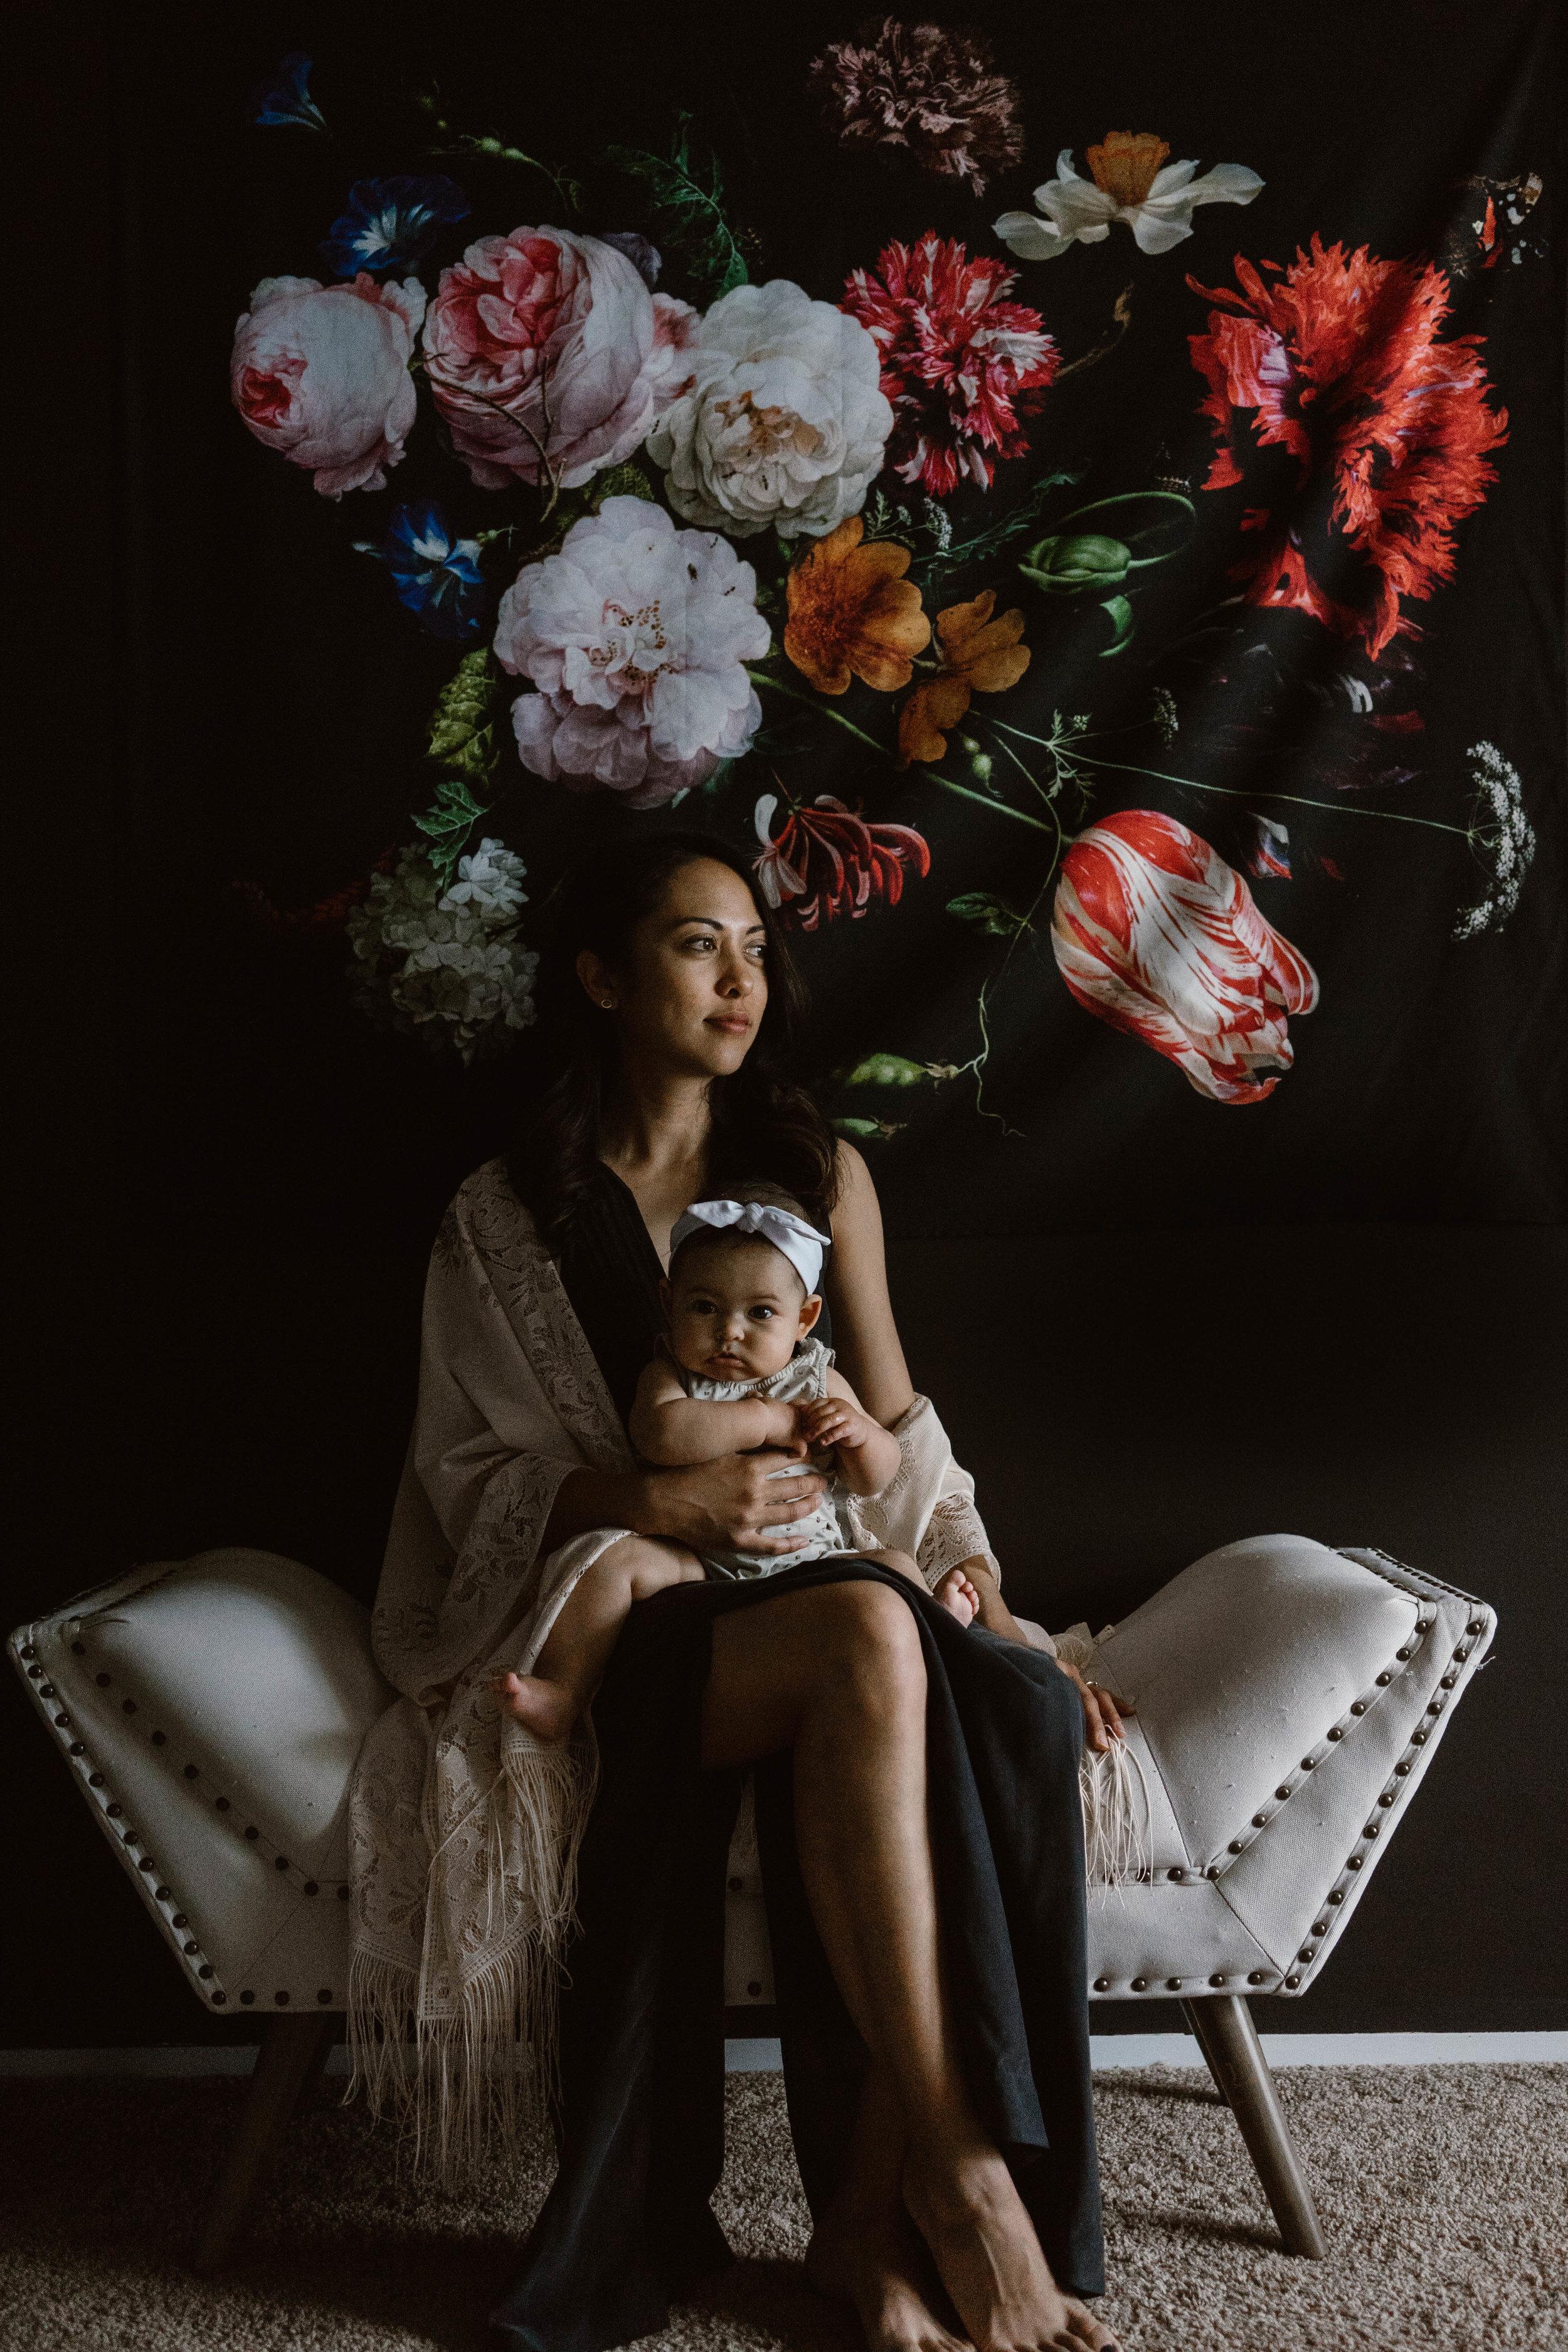 CHANTAL + JASON + VERA   click to see mother's day